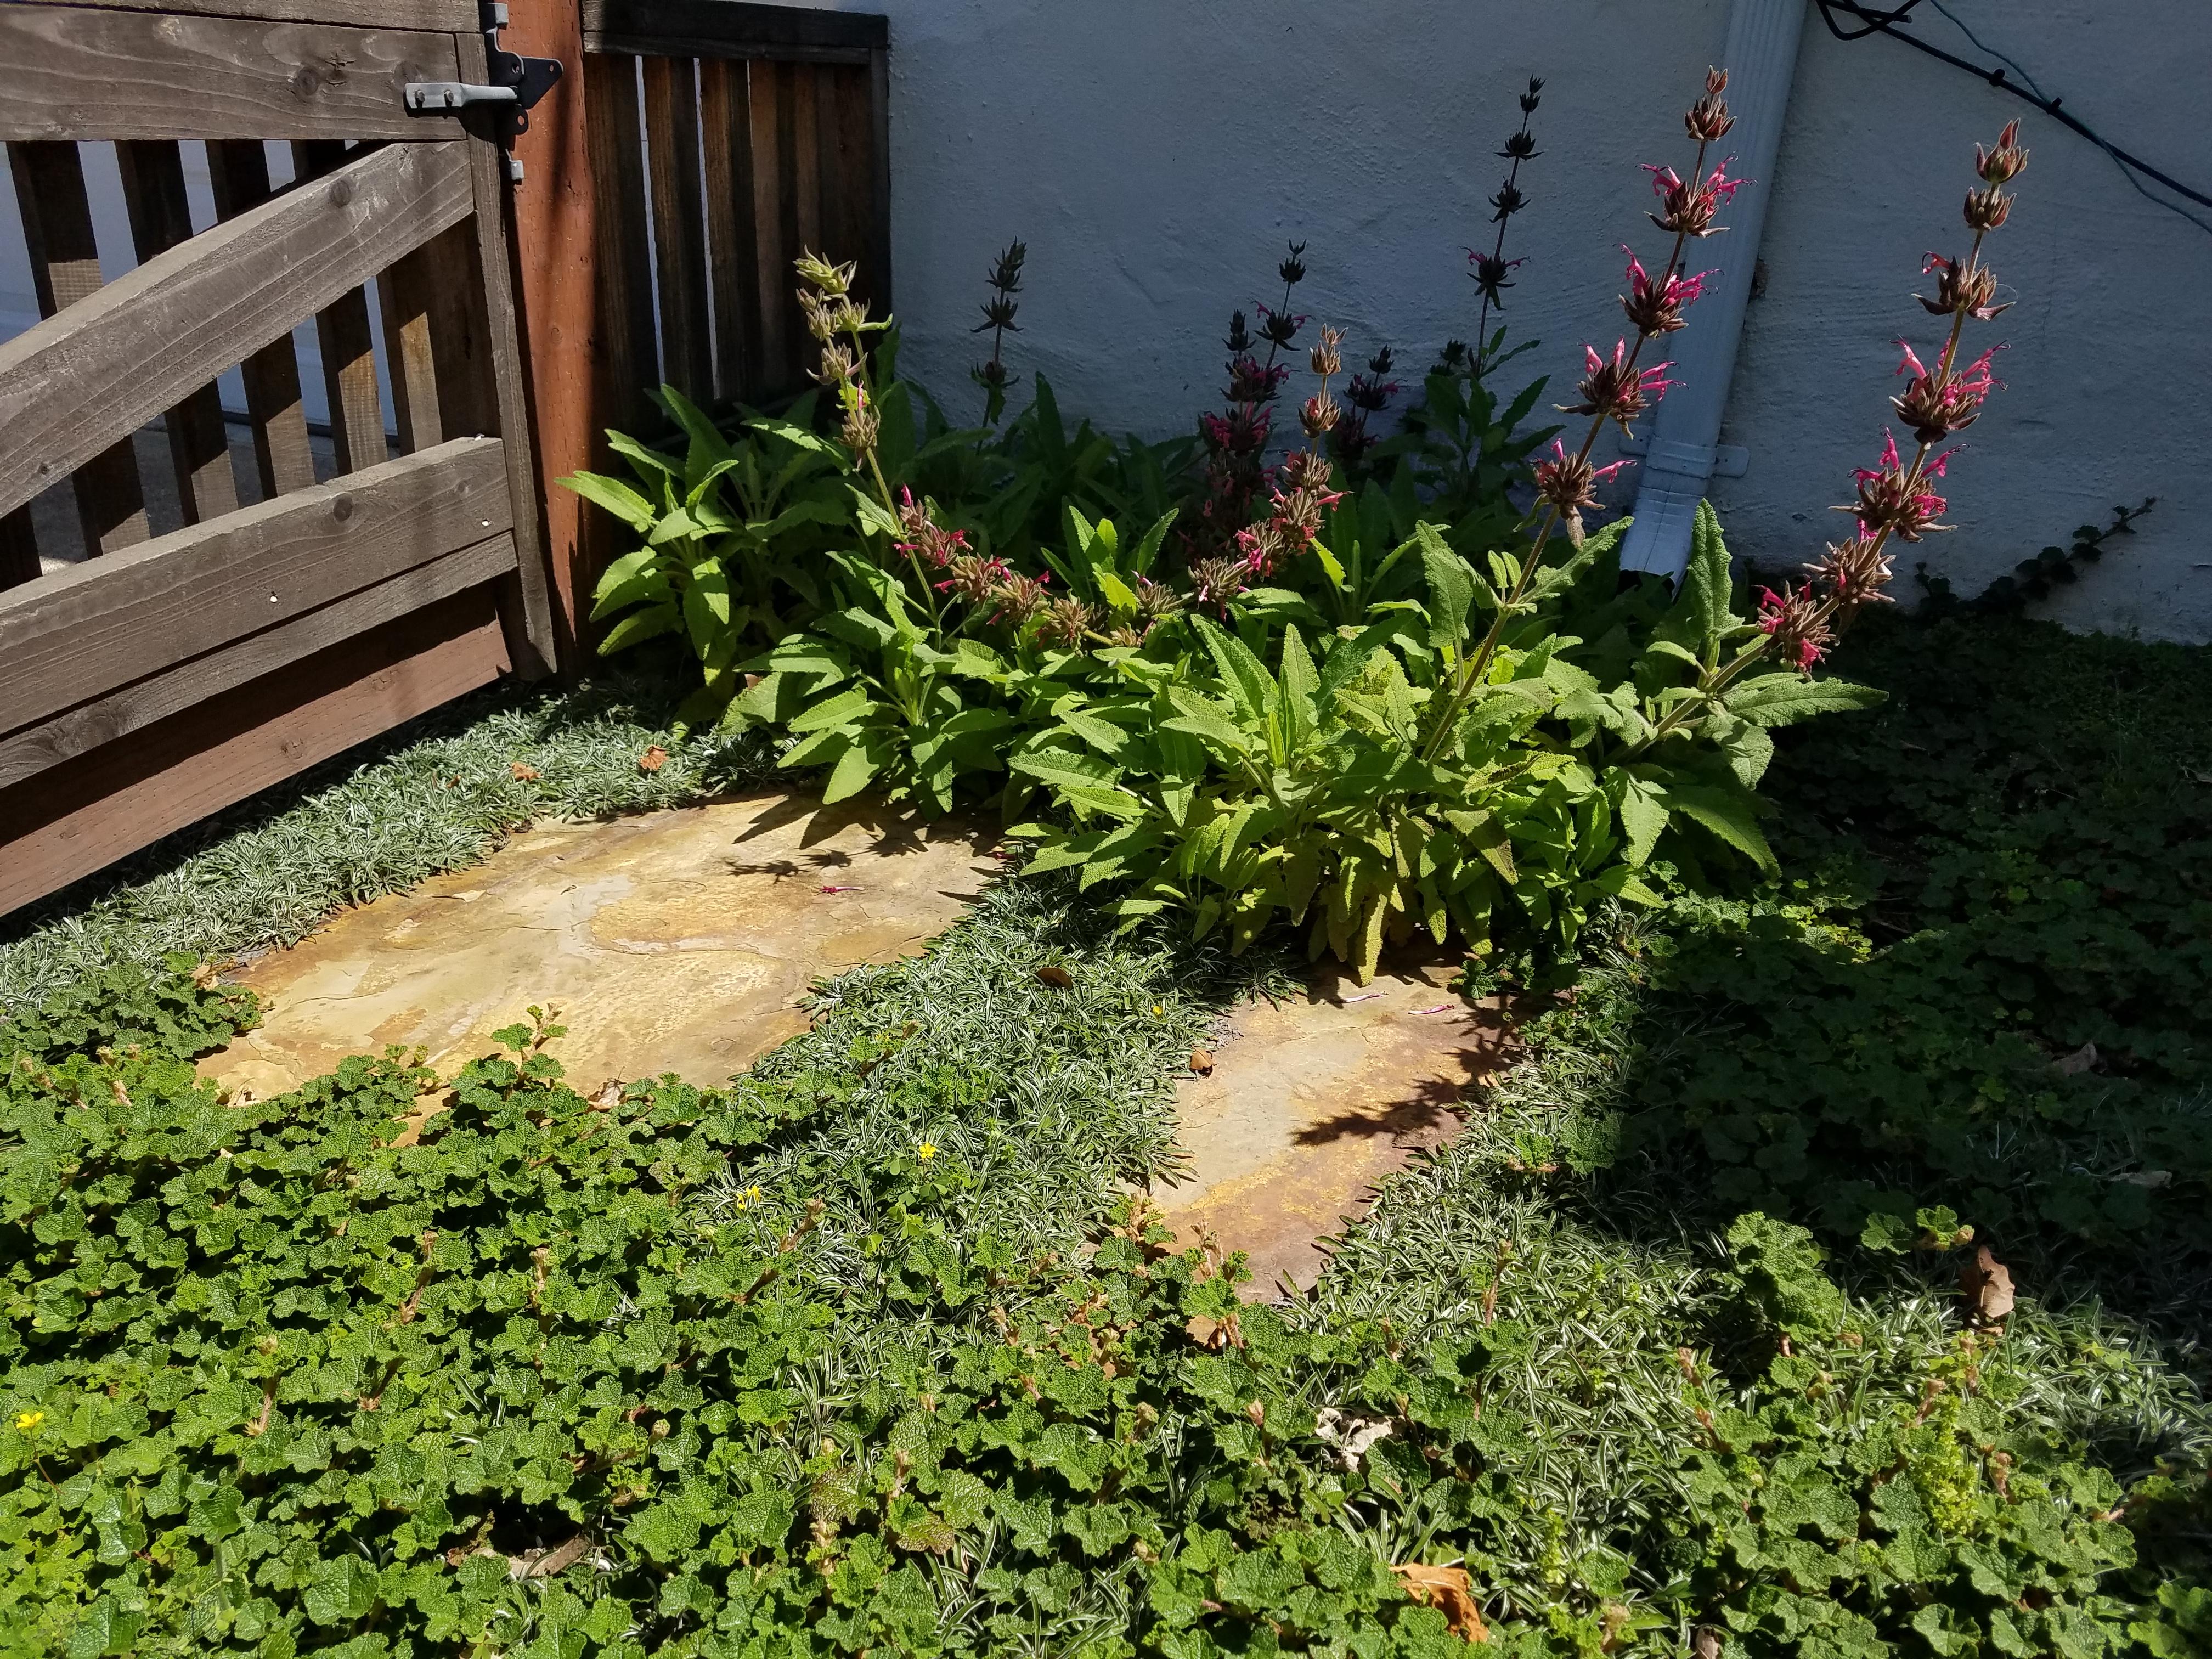 Dymondia margaretae, Salvia spathacea, Rubus pentalobus